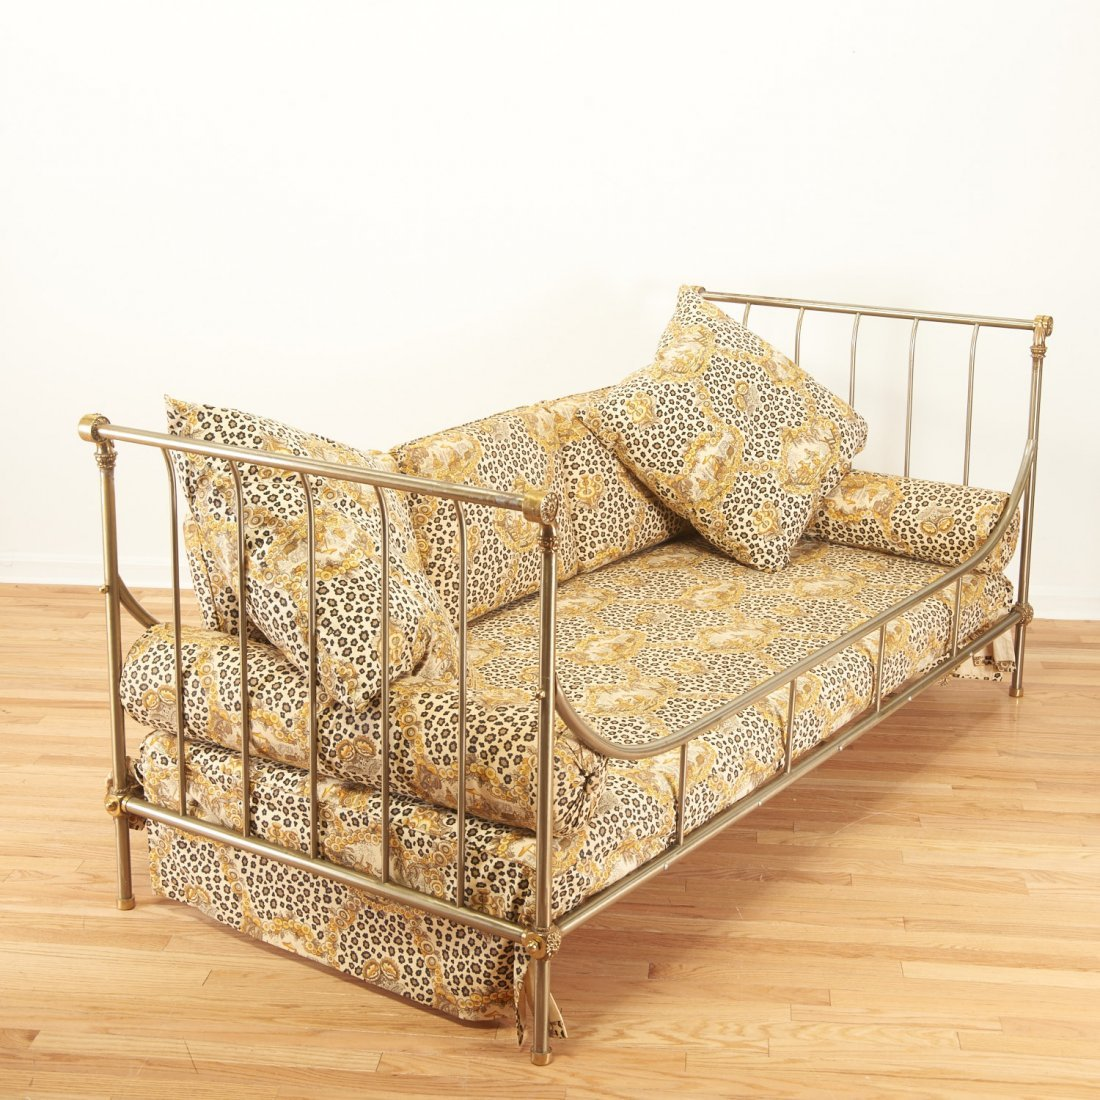 Maison Jansen style brass, steel campaign bed